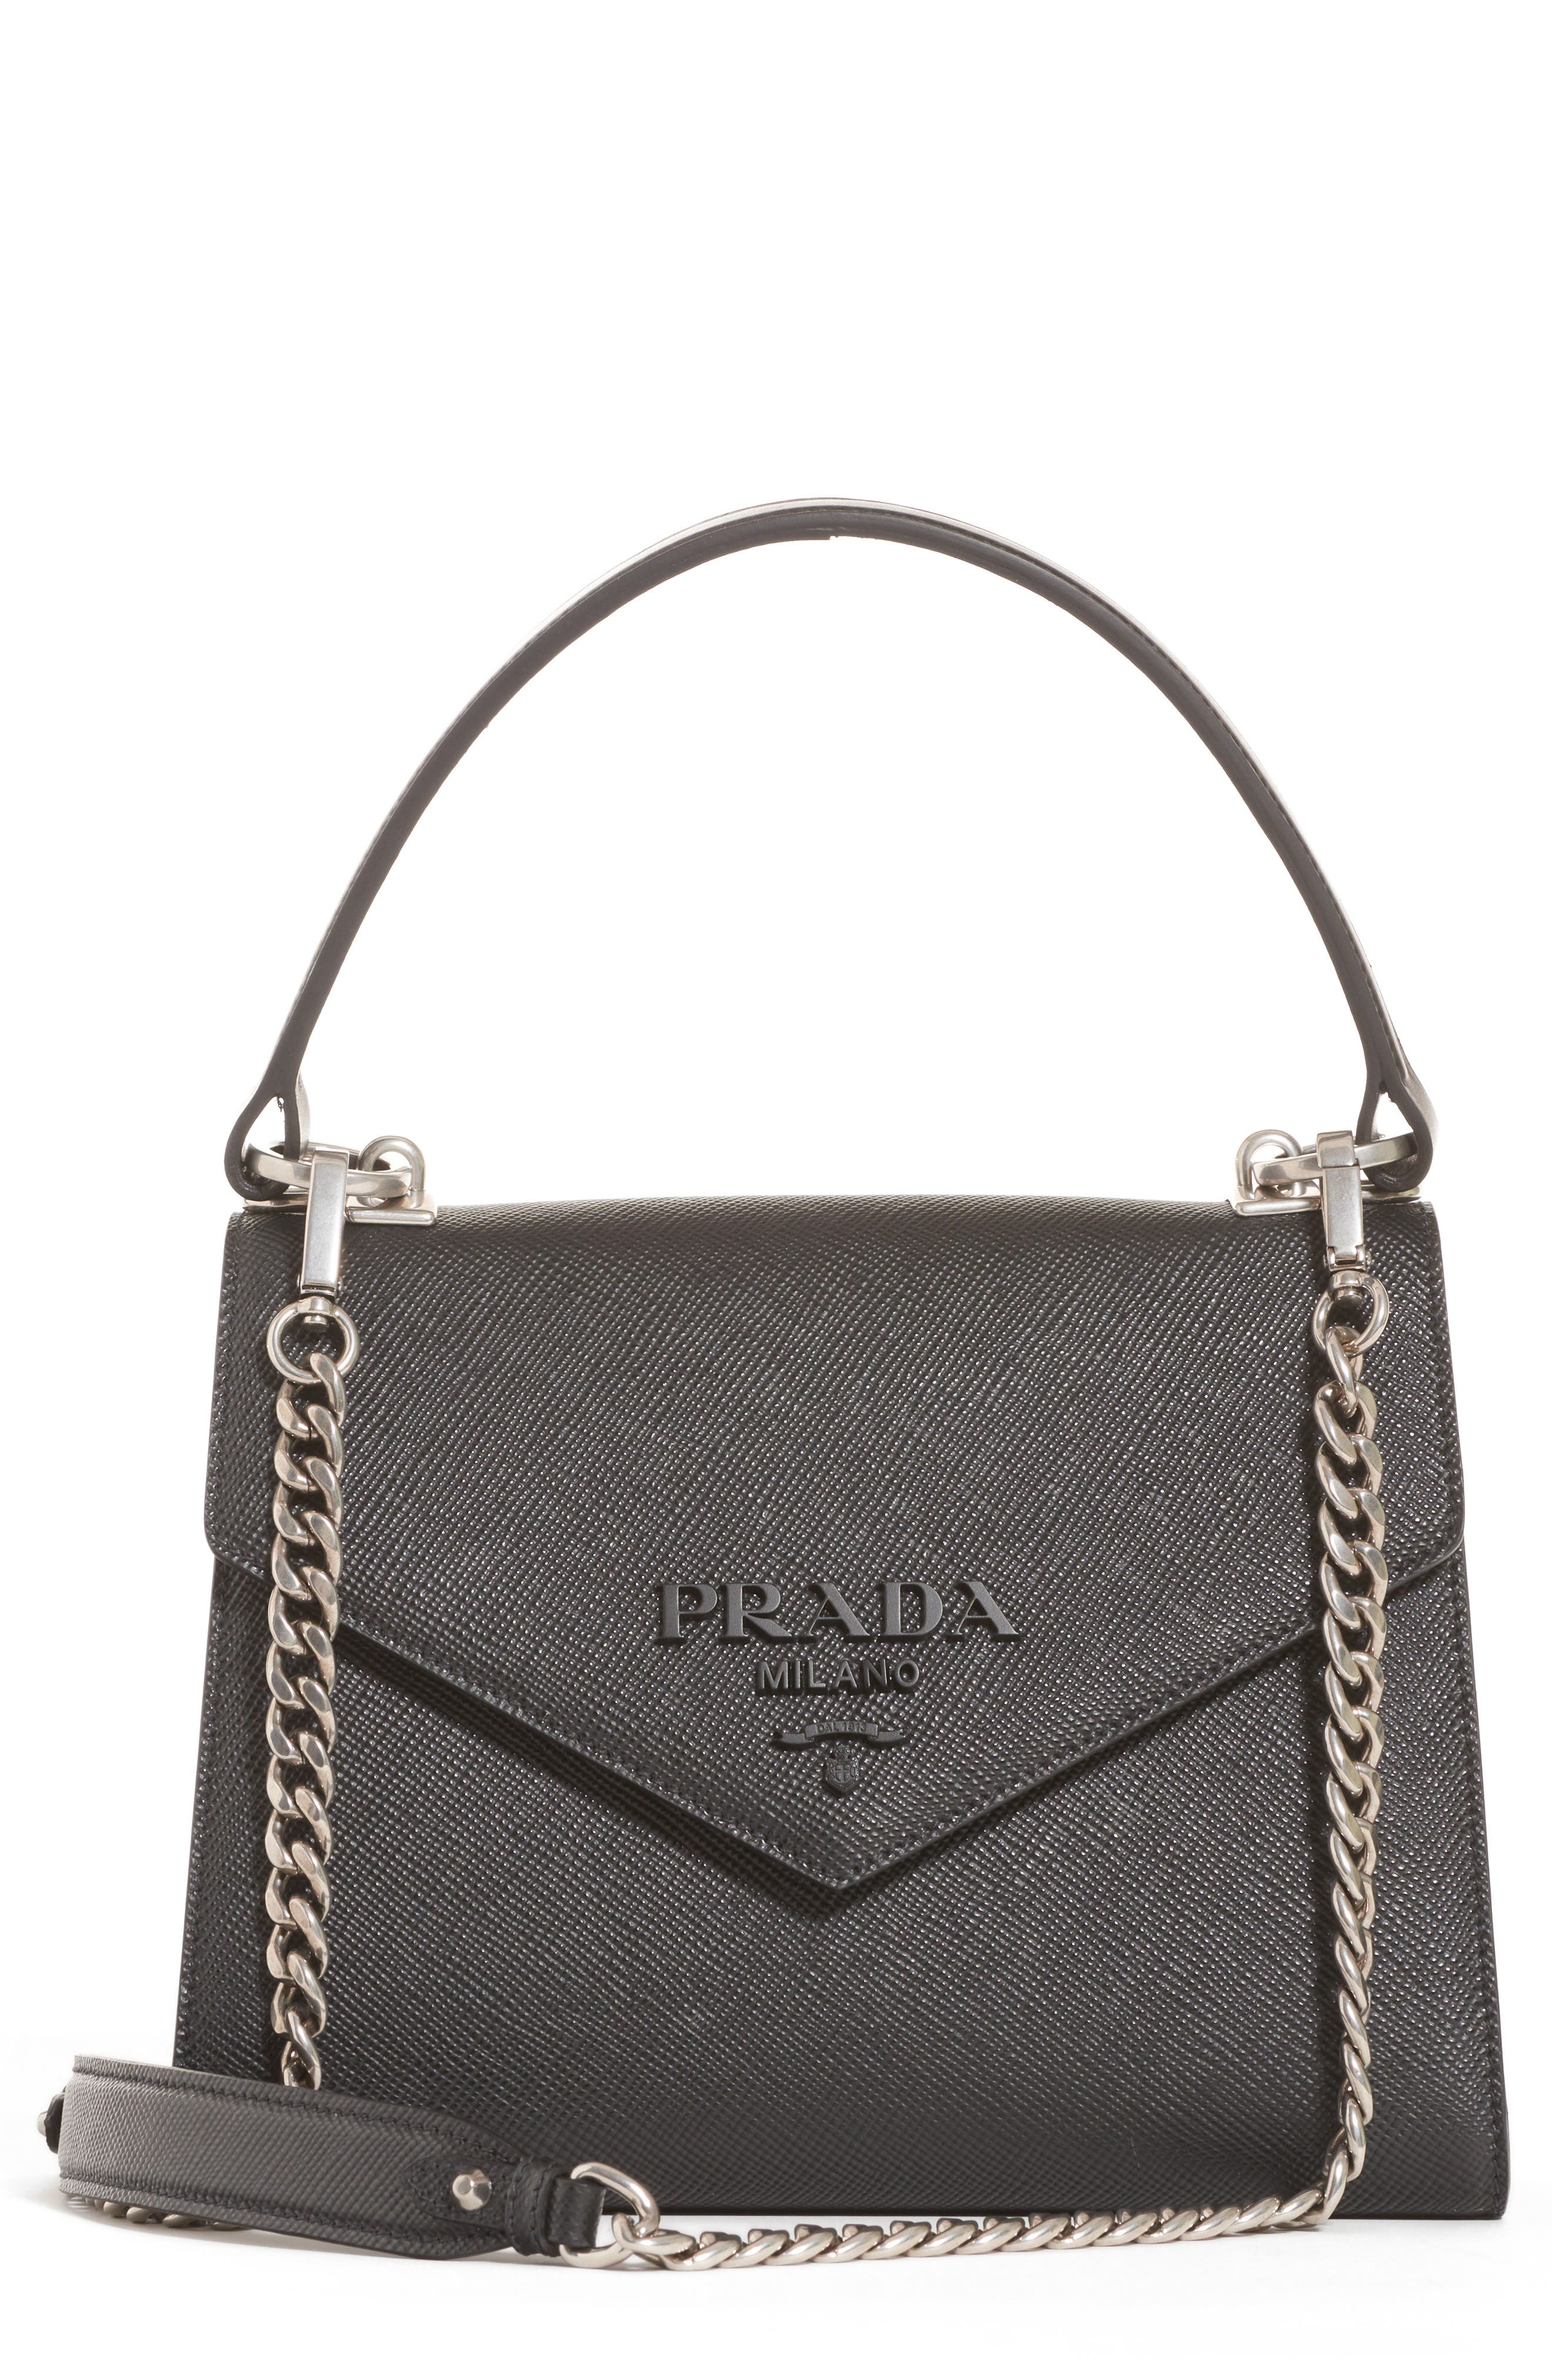 Monochrome Logo Top Handle Leather Handbag,                         Main,                         color, NERO